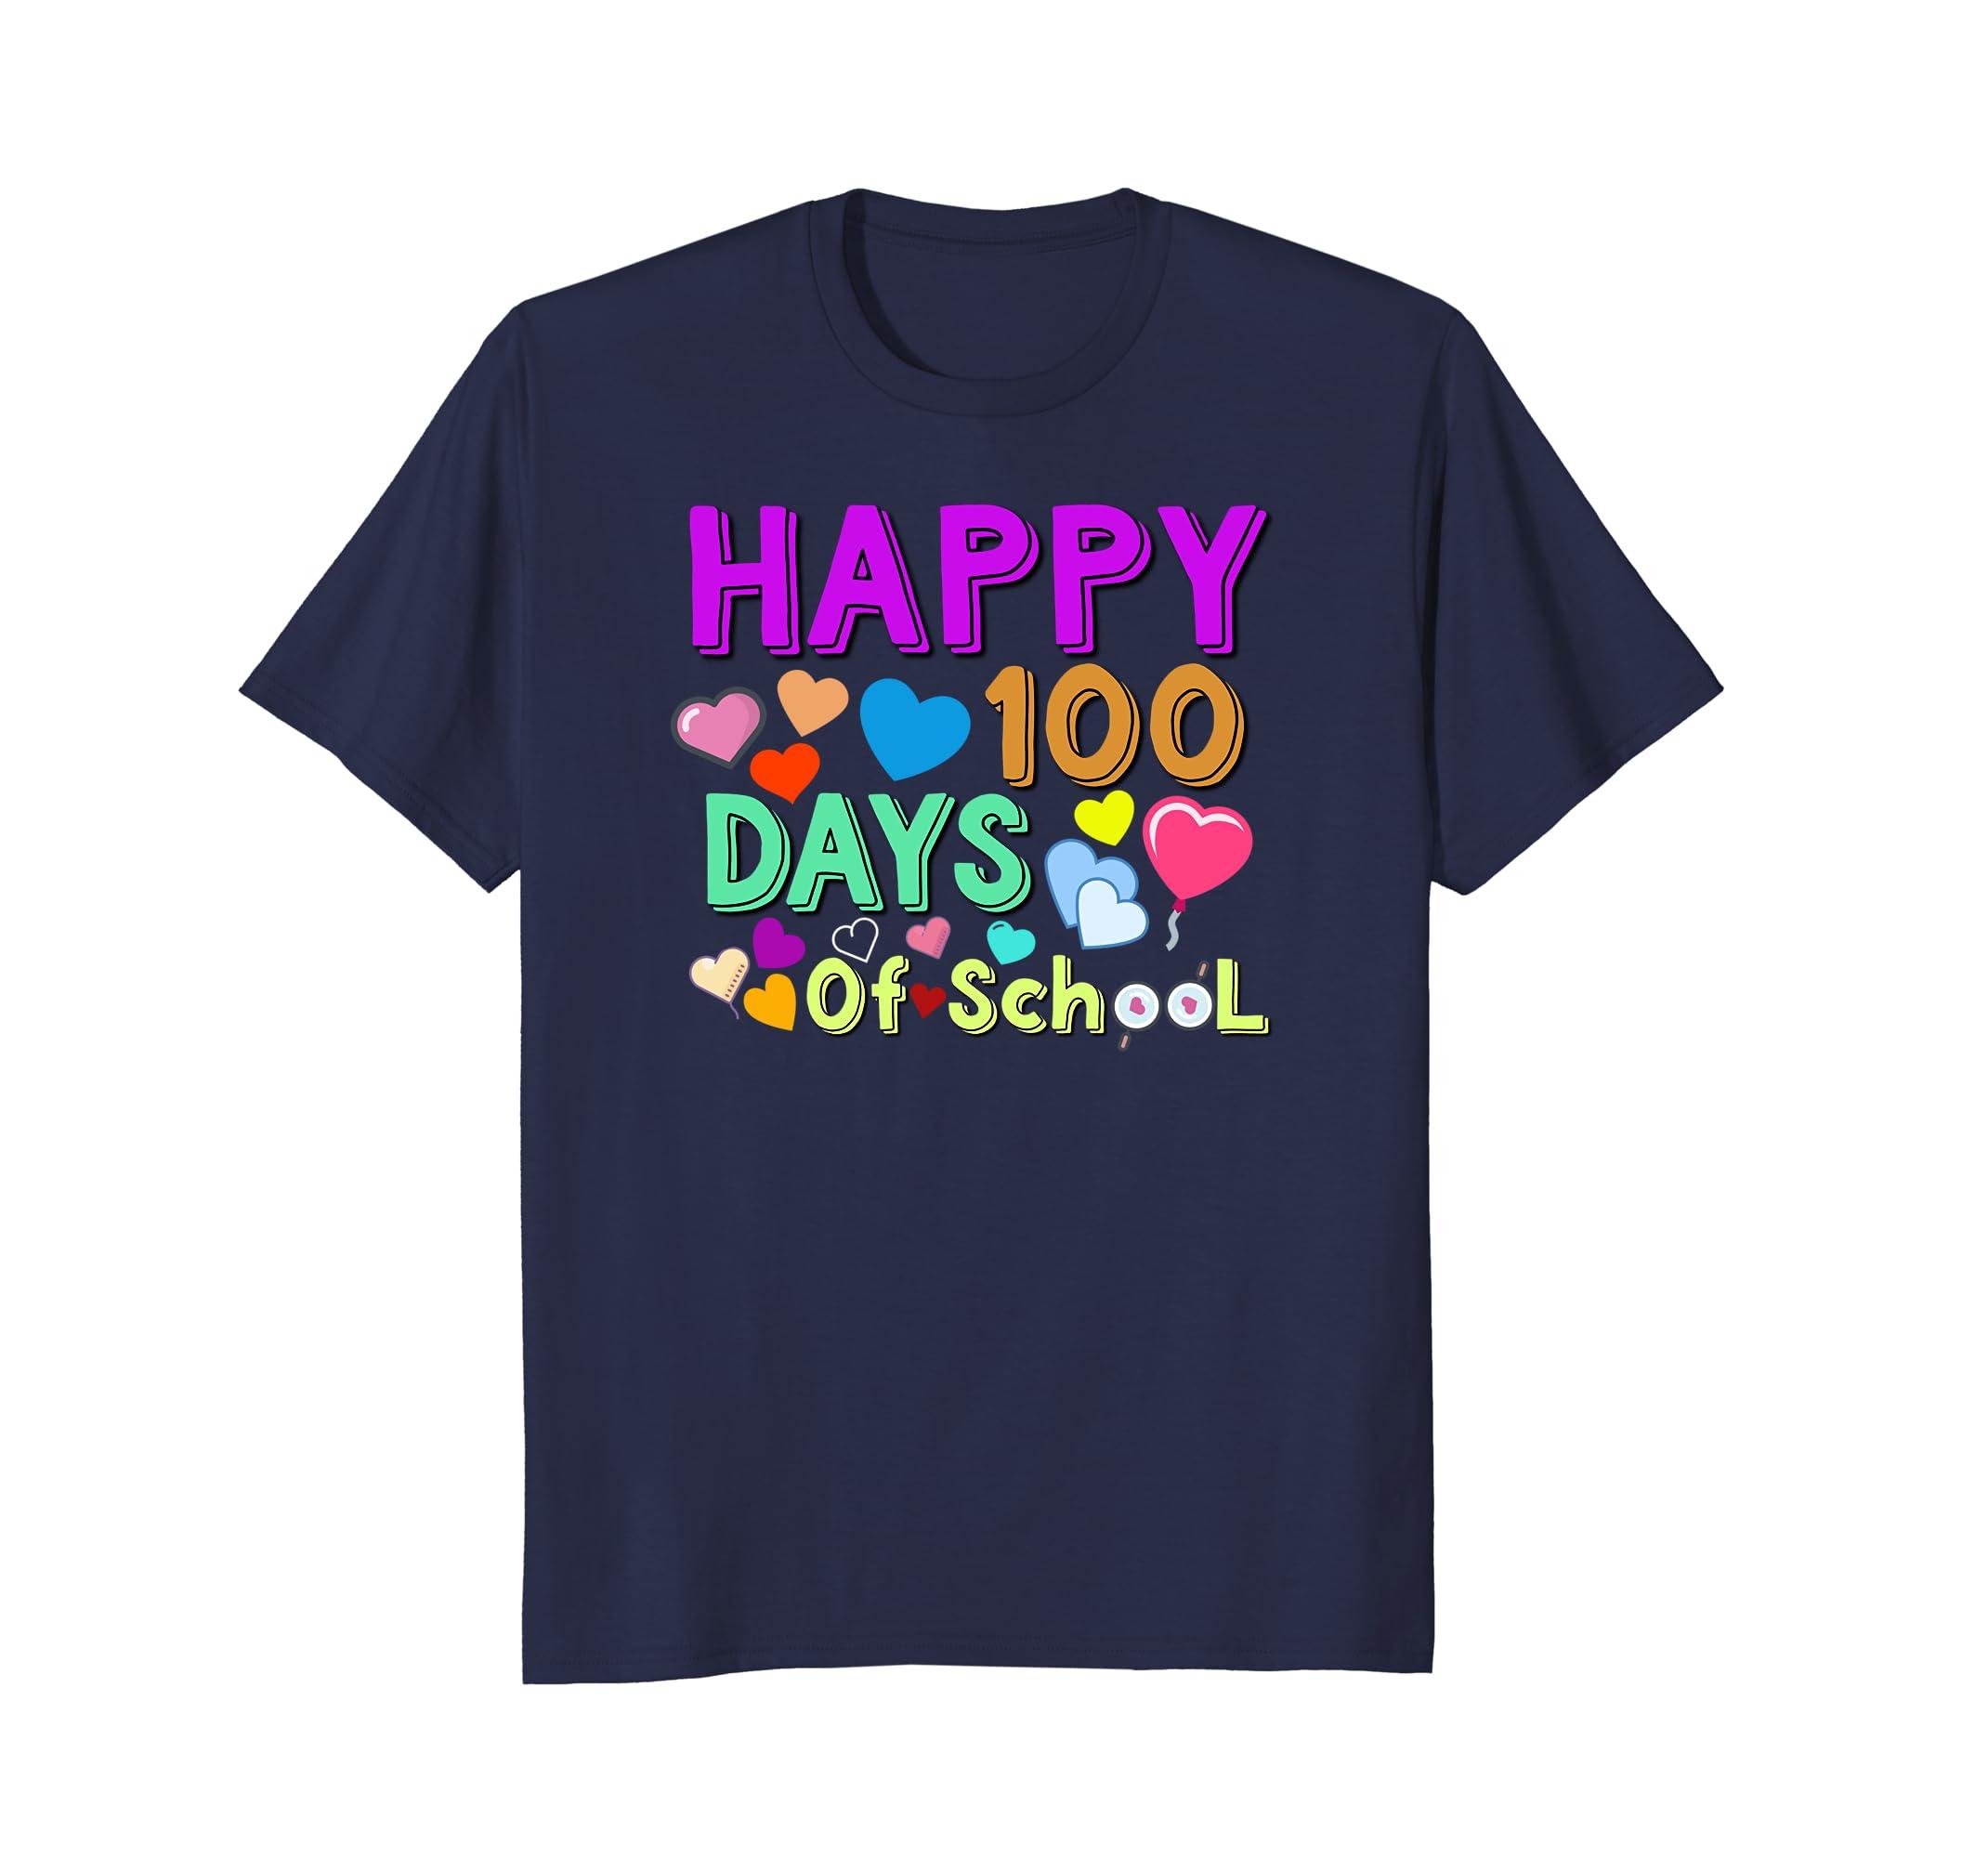 100th Day of School Shirt | Happy 100 Days Of School T-shirt-TH